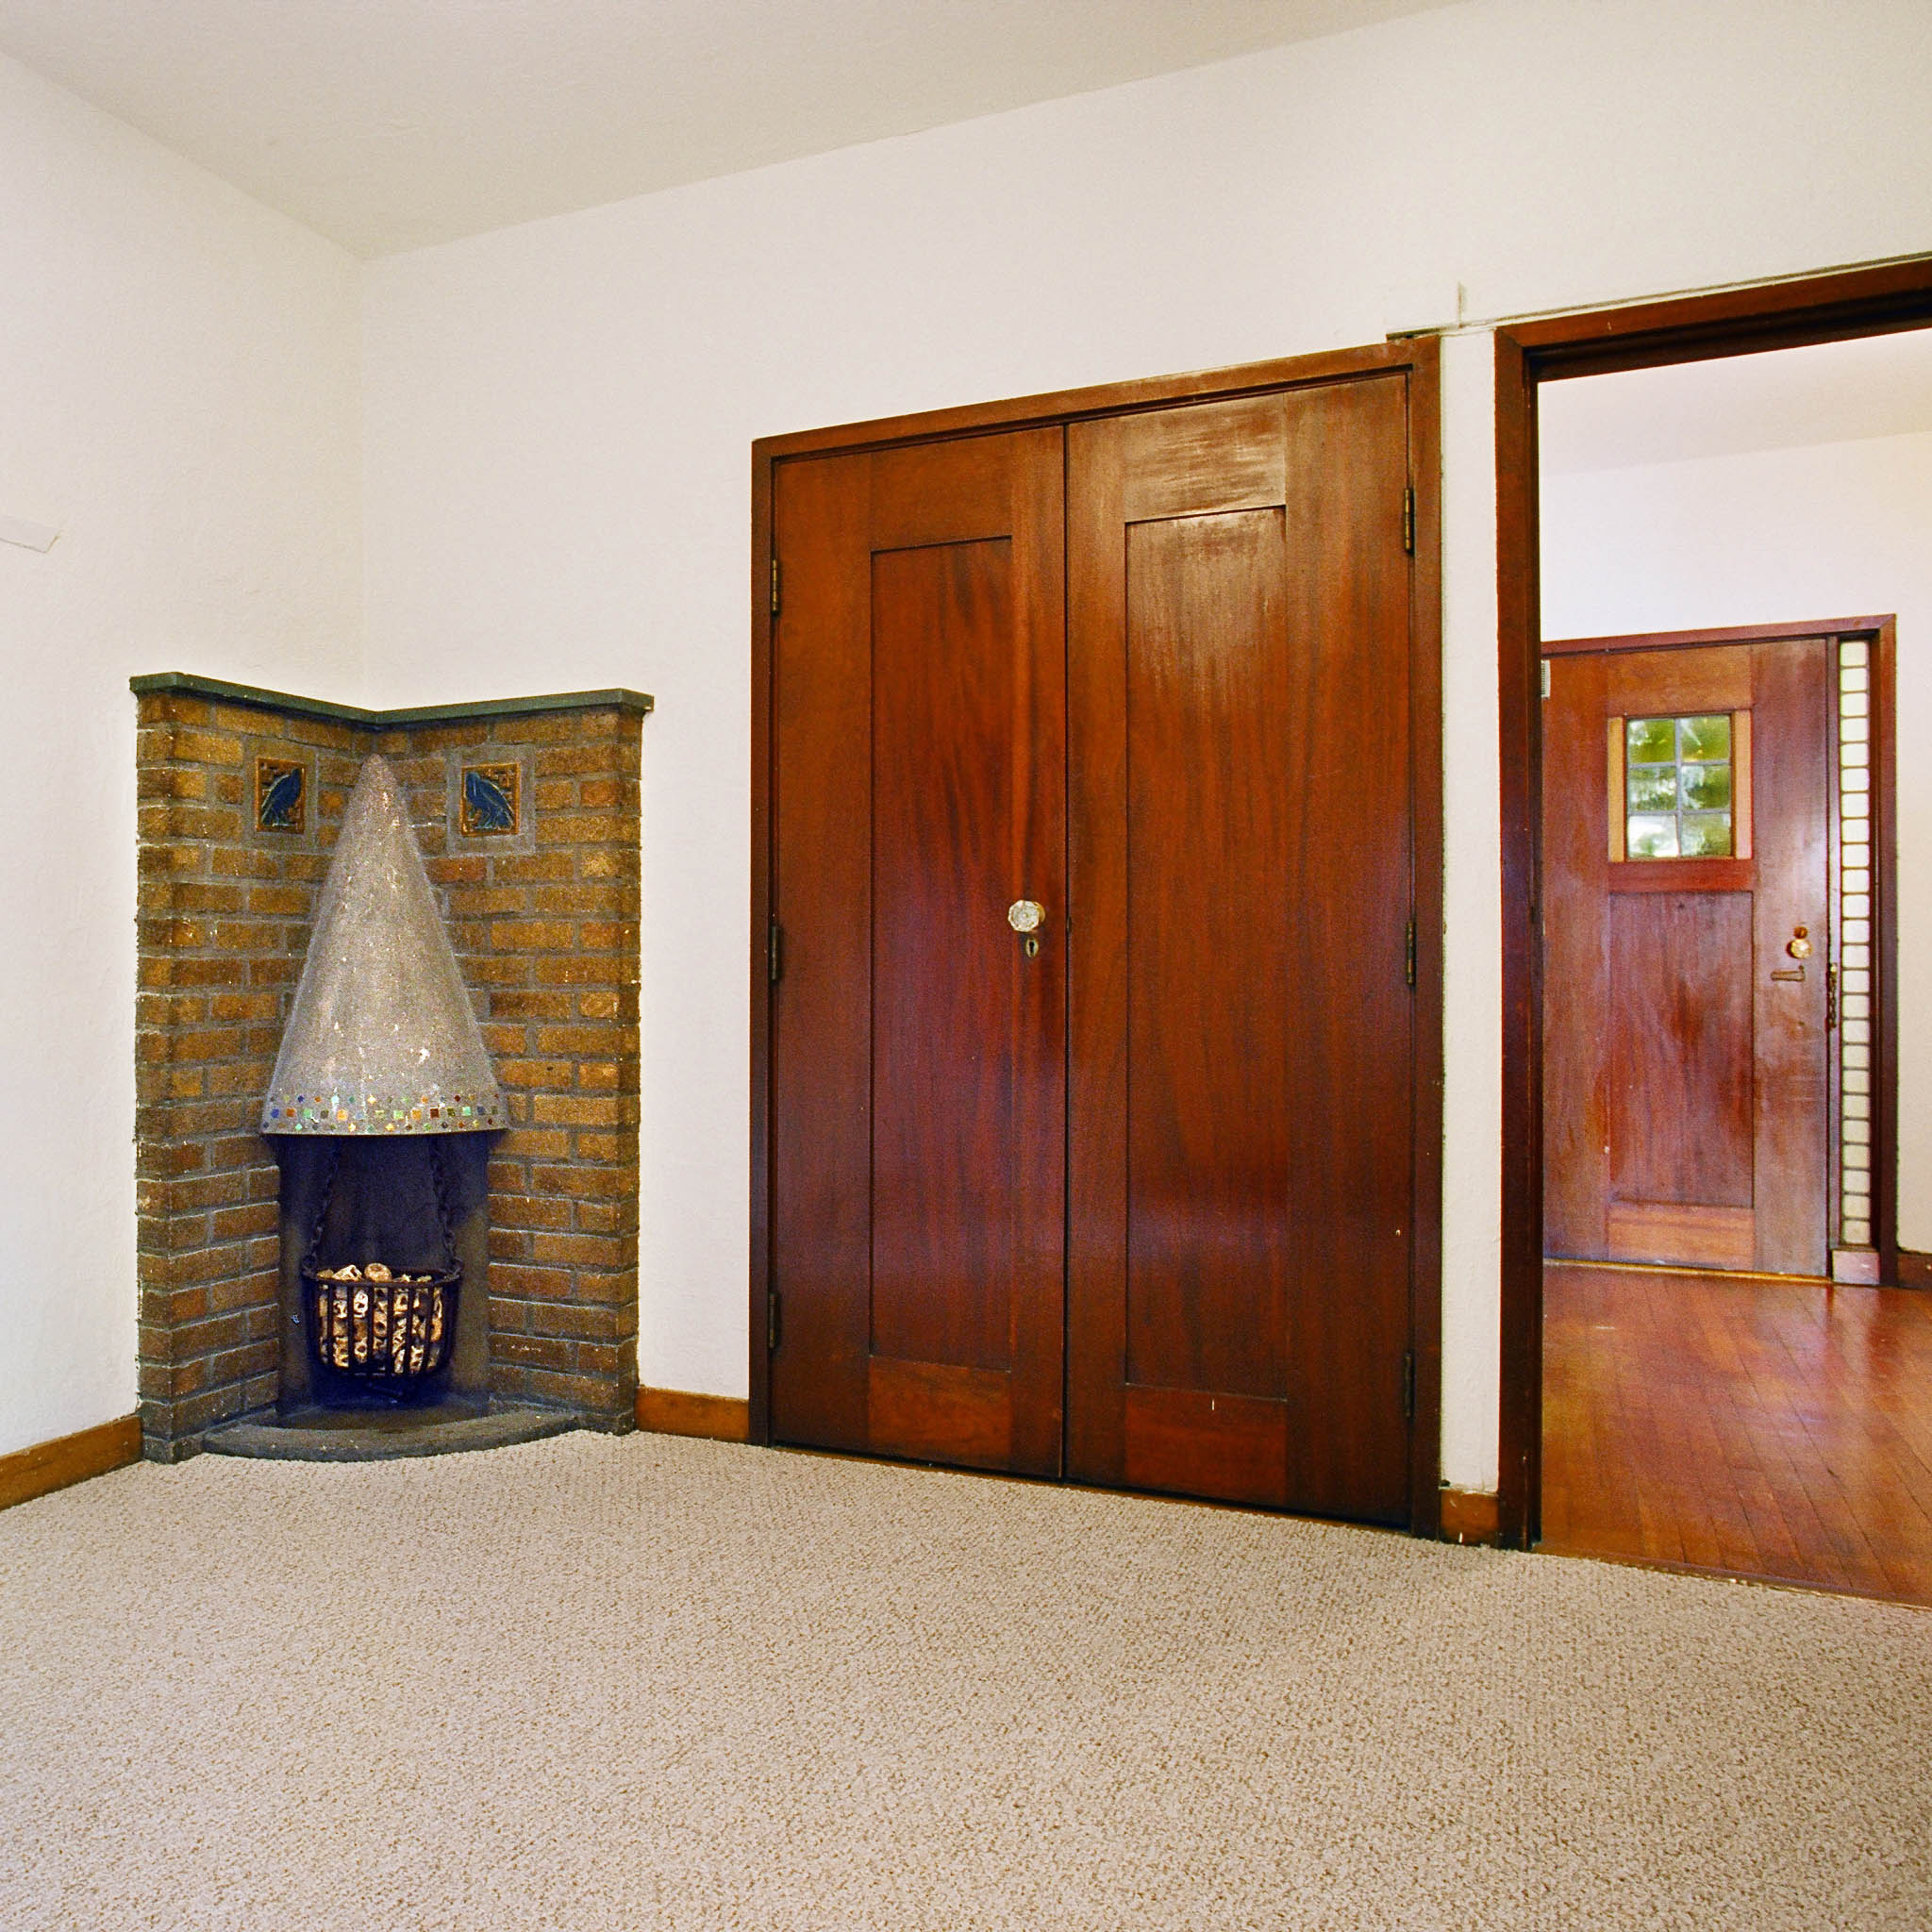 interior of 342 S. Highland Ave, Apt. 11B 1